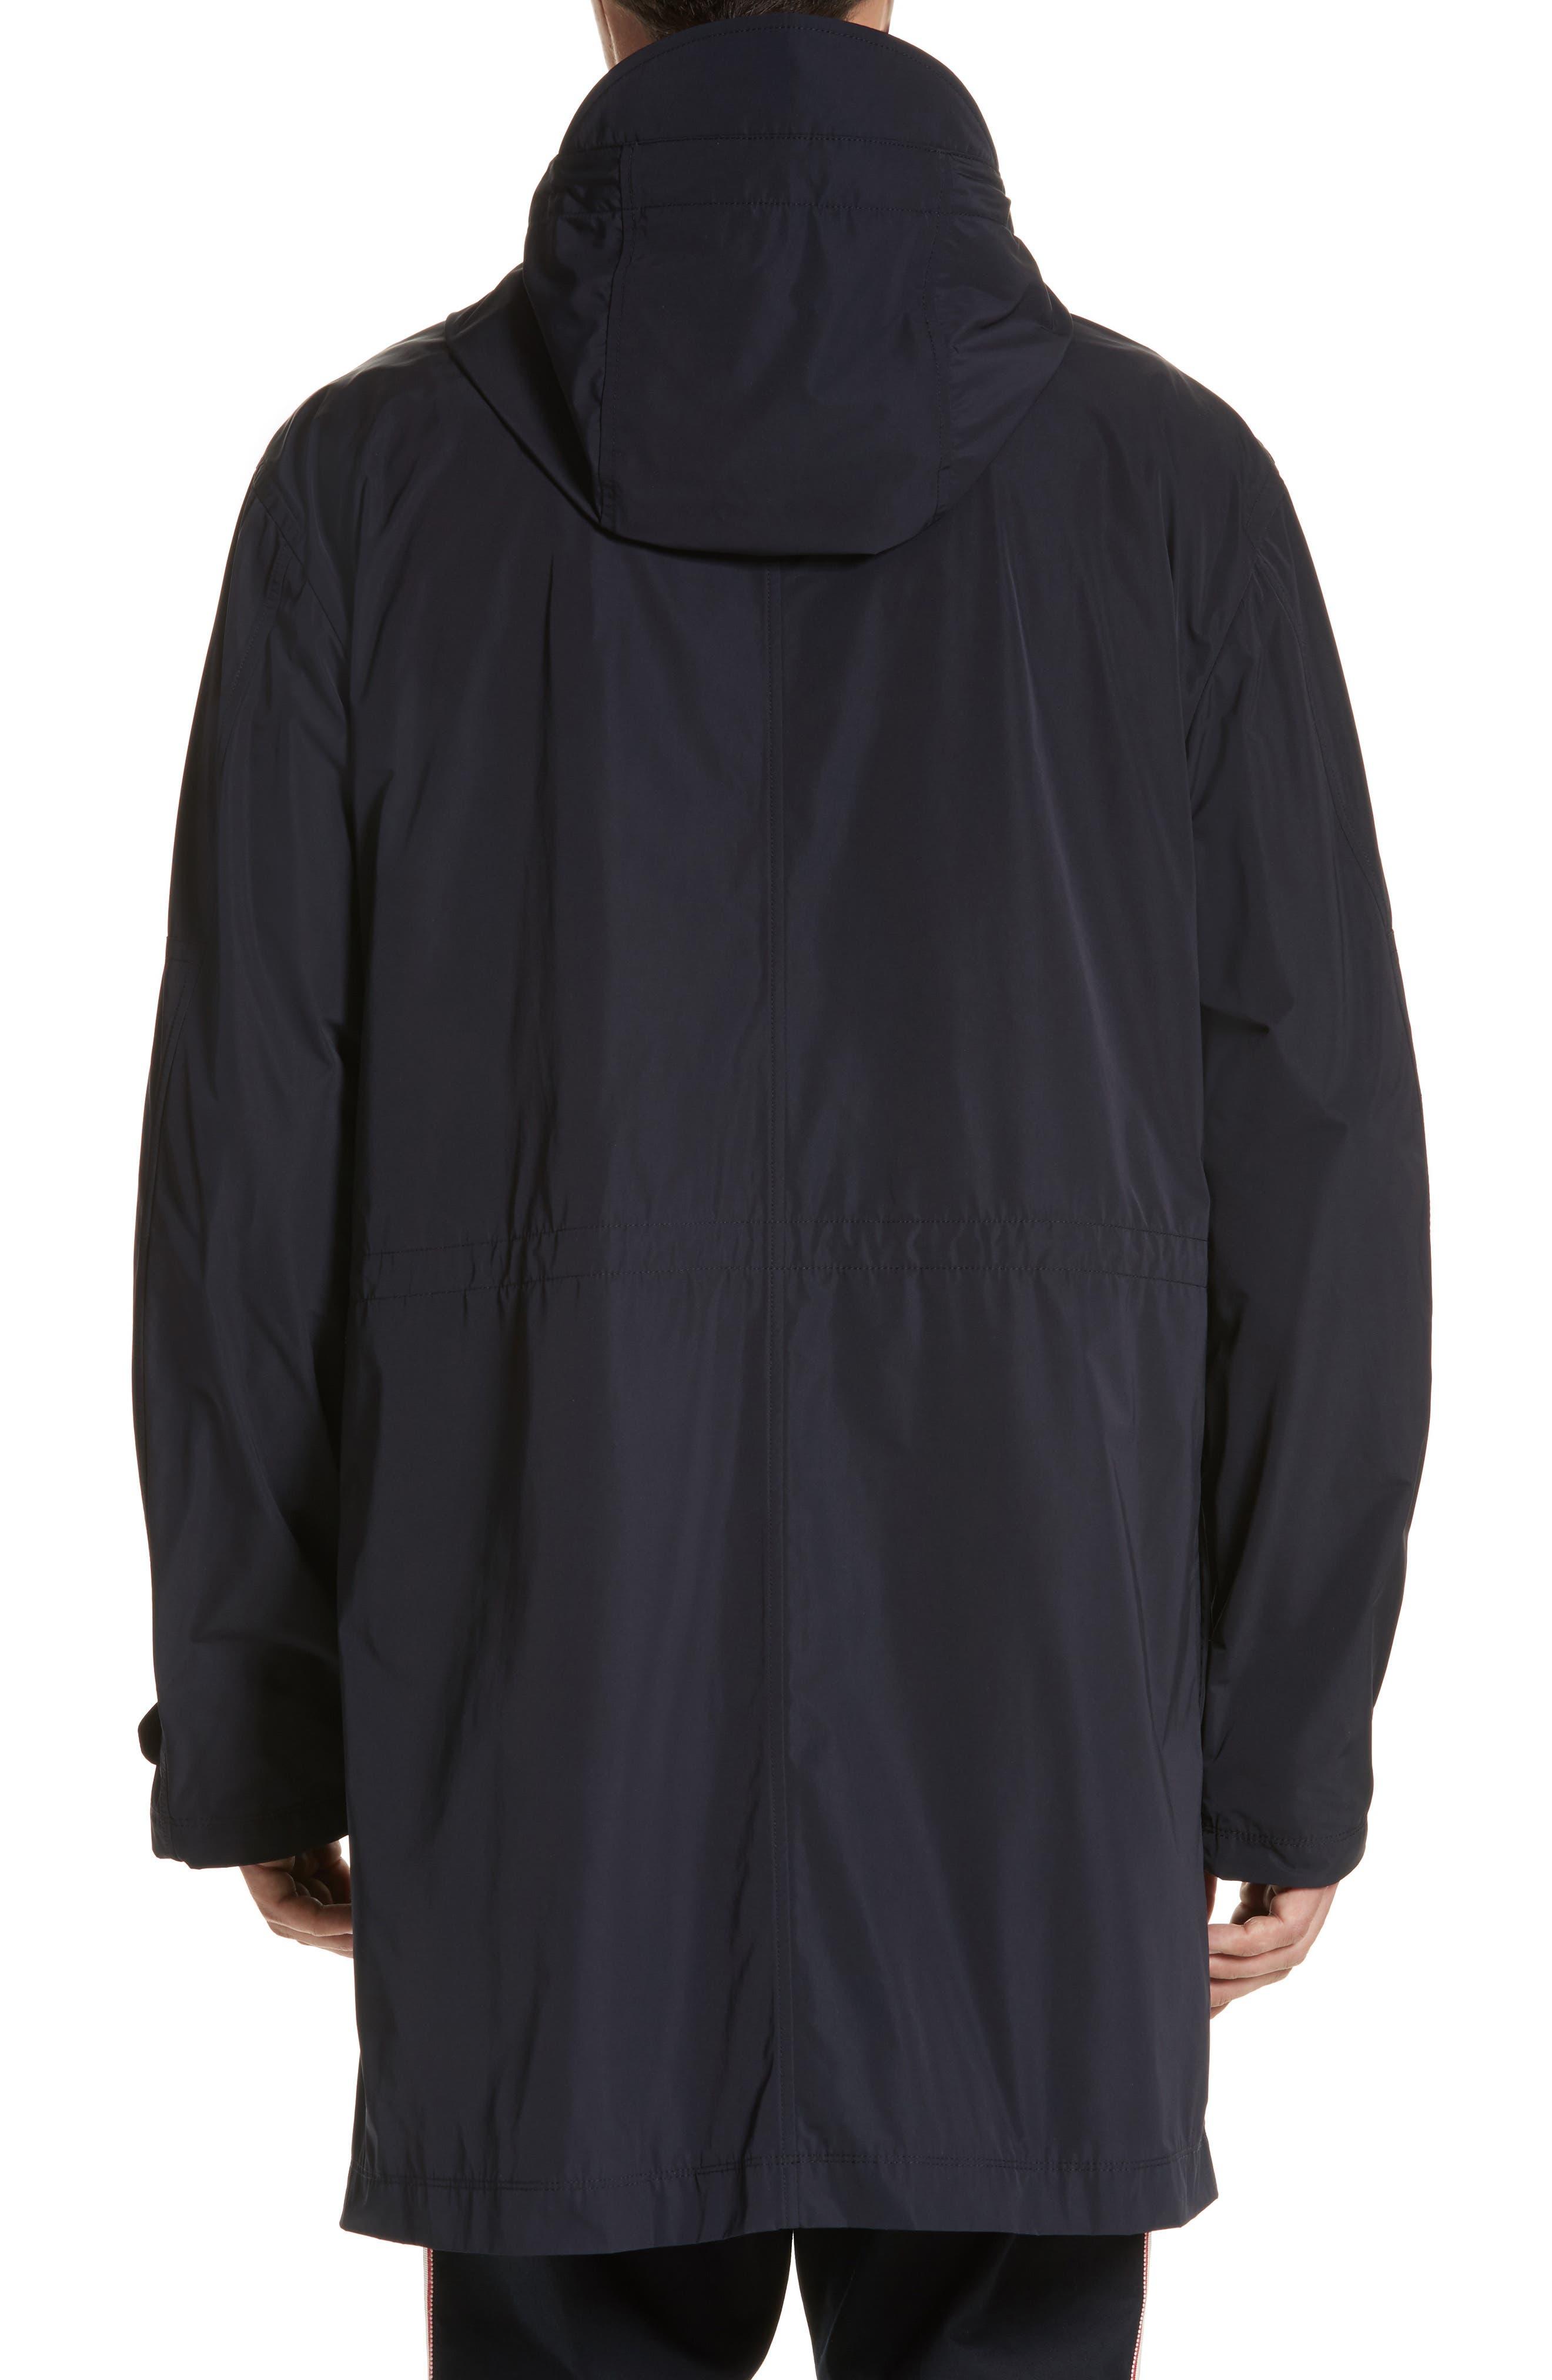 Guiers Long Raincoat,                             Alternate thumbnail 2, color,                             Navy